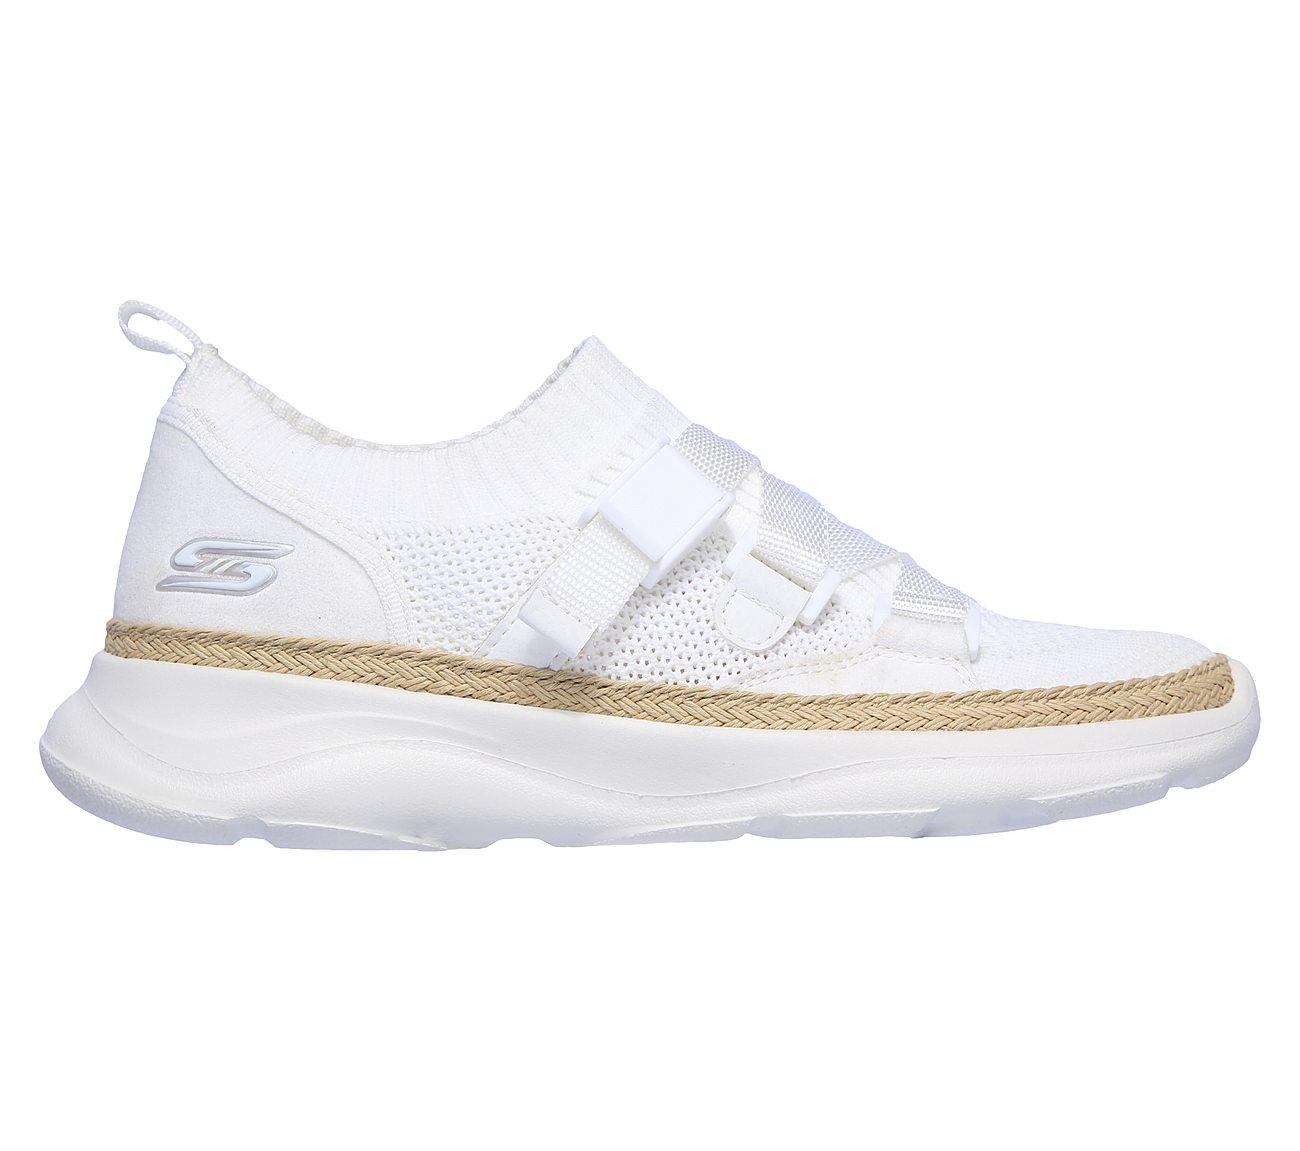 mizuno womens volleyball shoes size 8 x 1 nm european idiomas